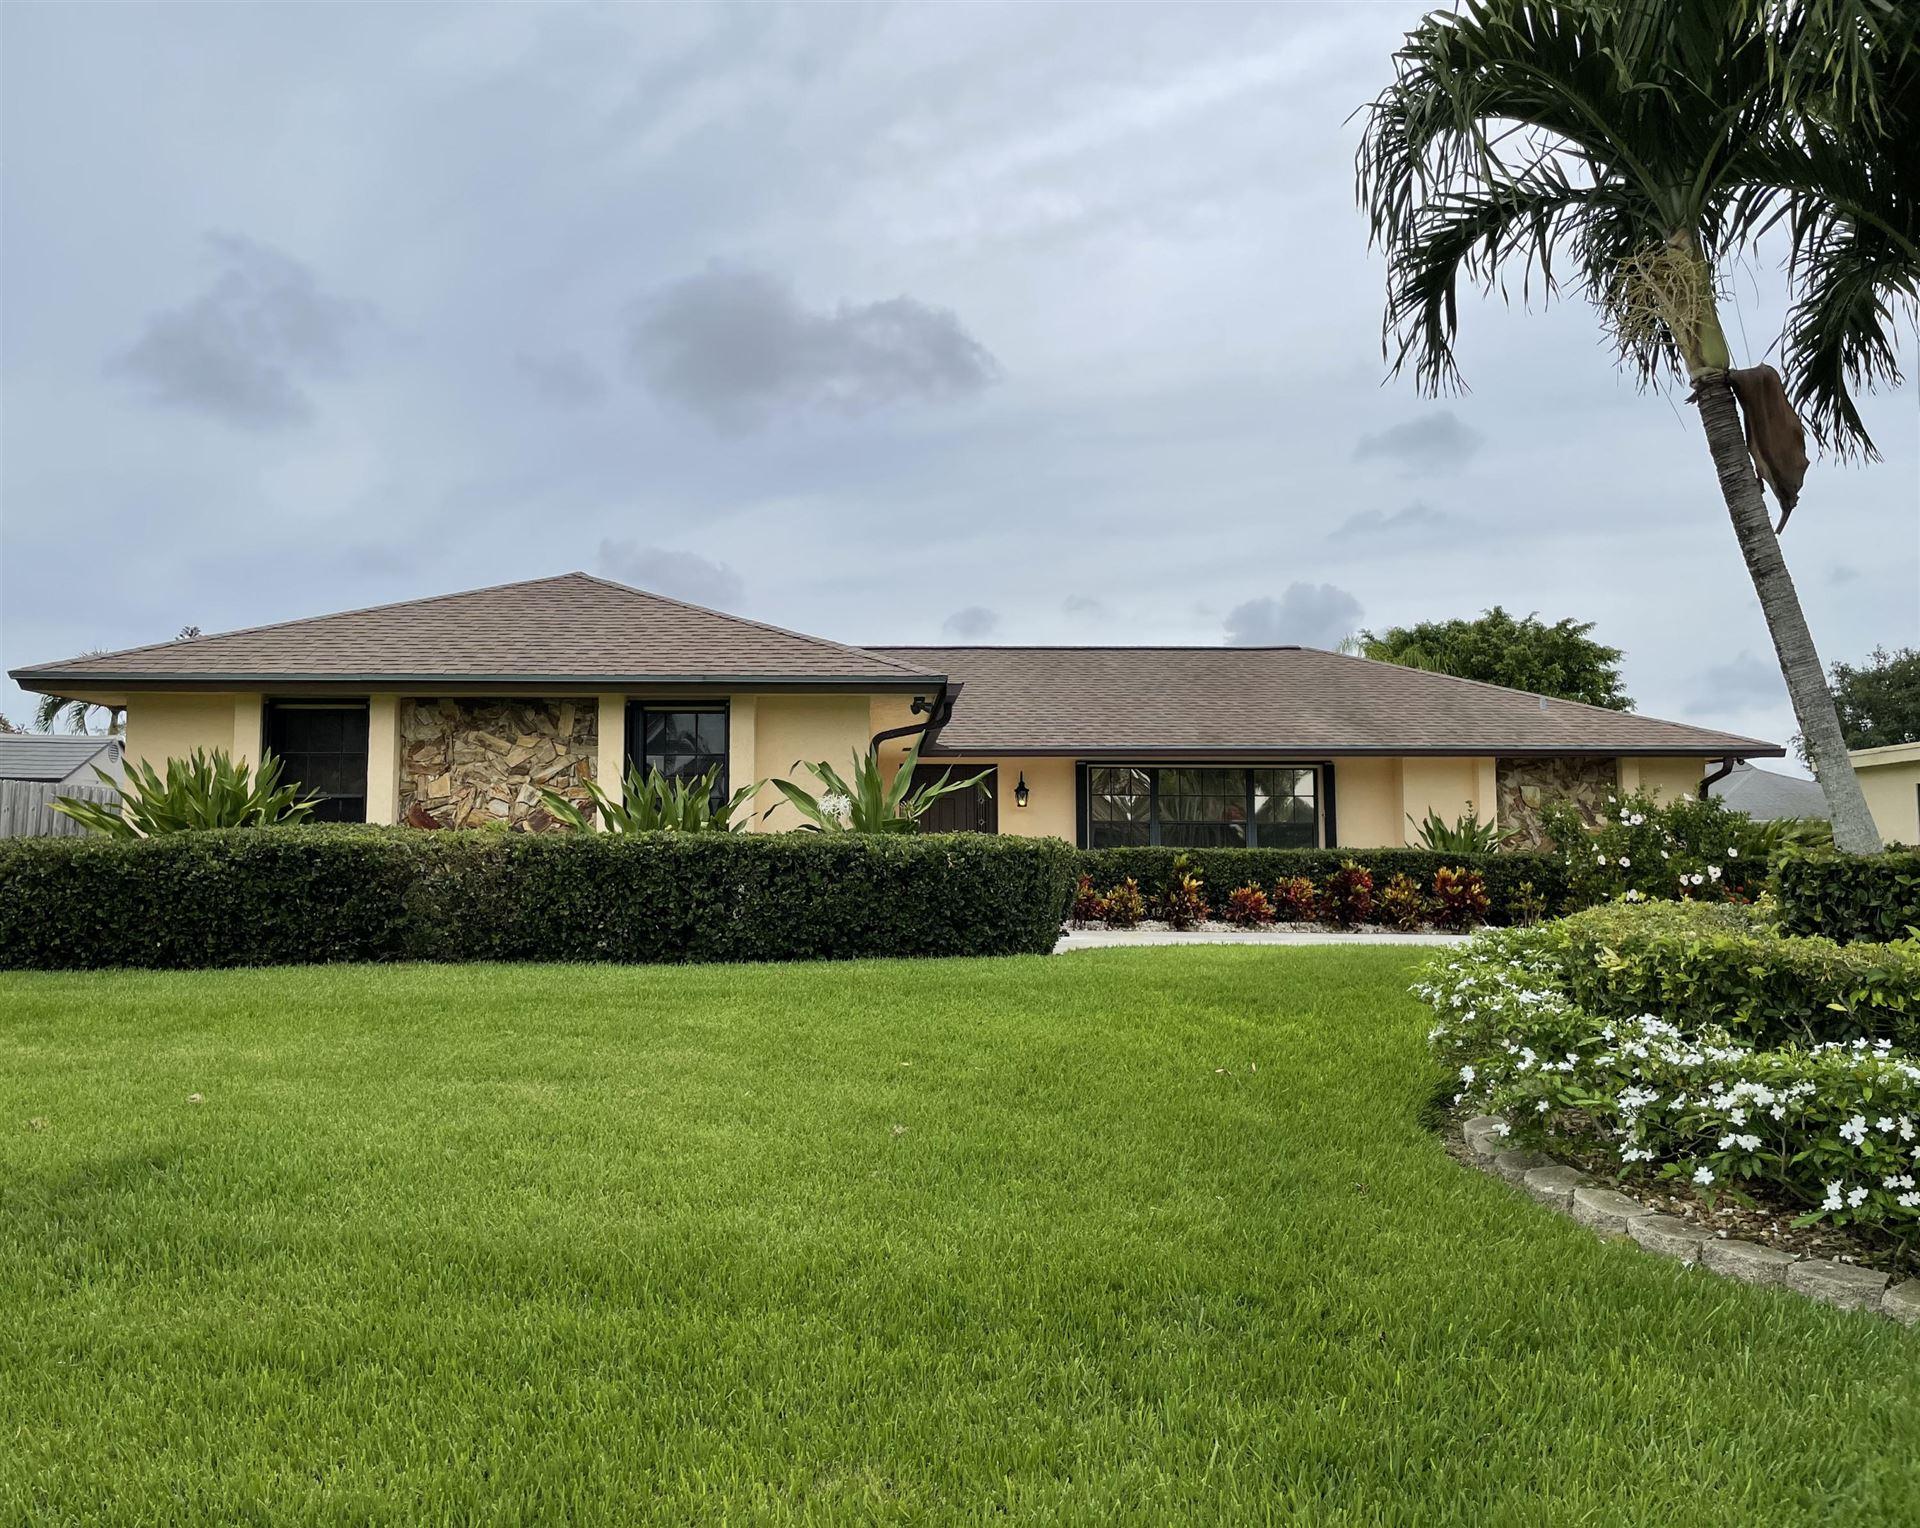 Photo of 11942 Hemlock Street, Palm Beach Gardens, FL 33410 (MLS # RX-10716509)